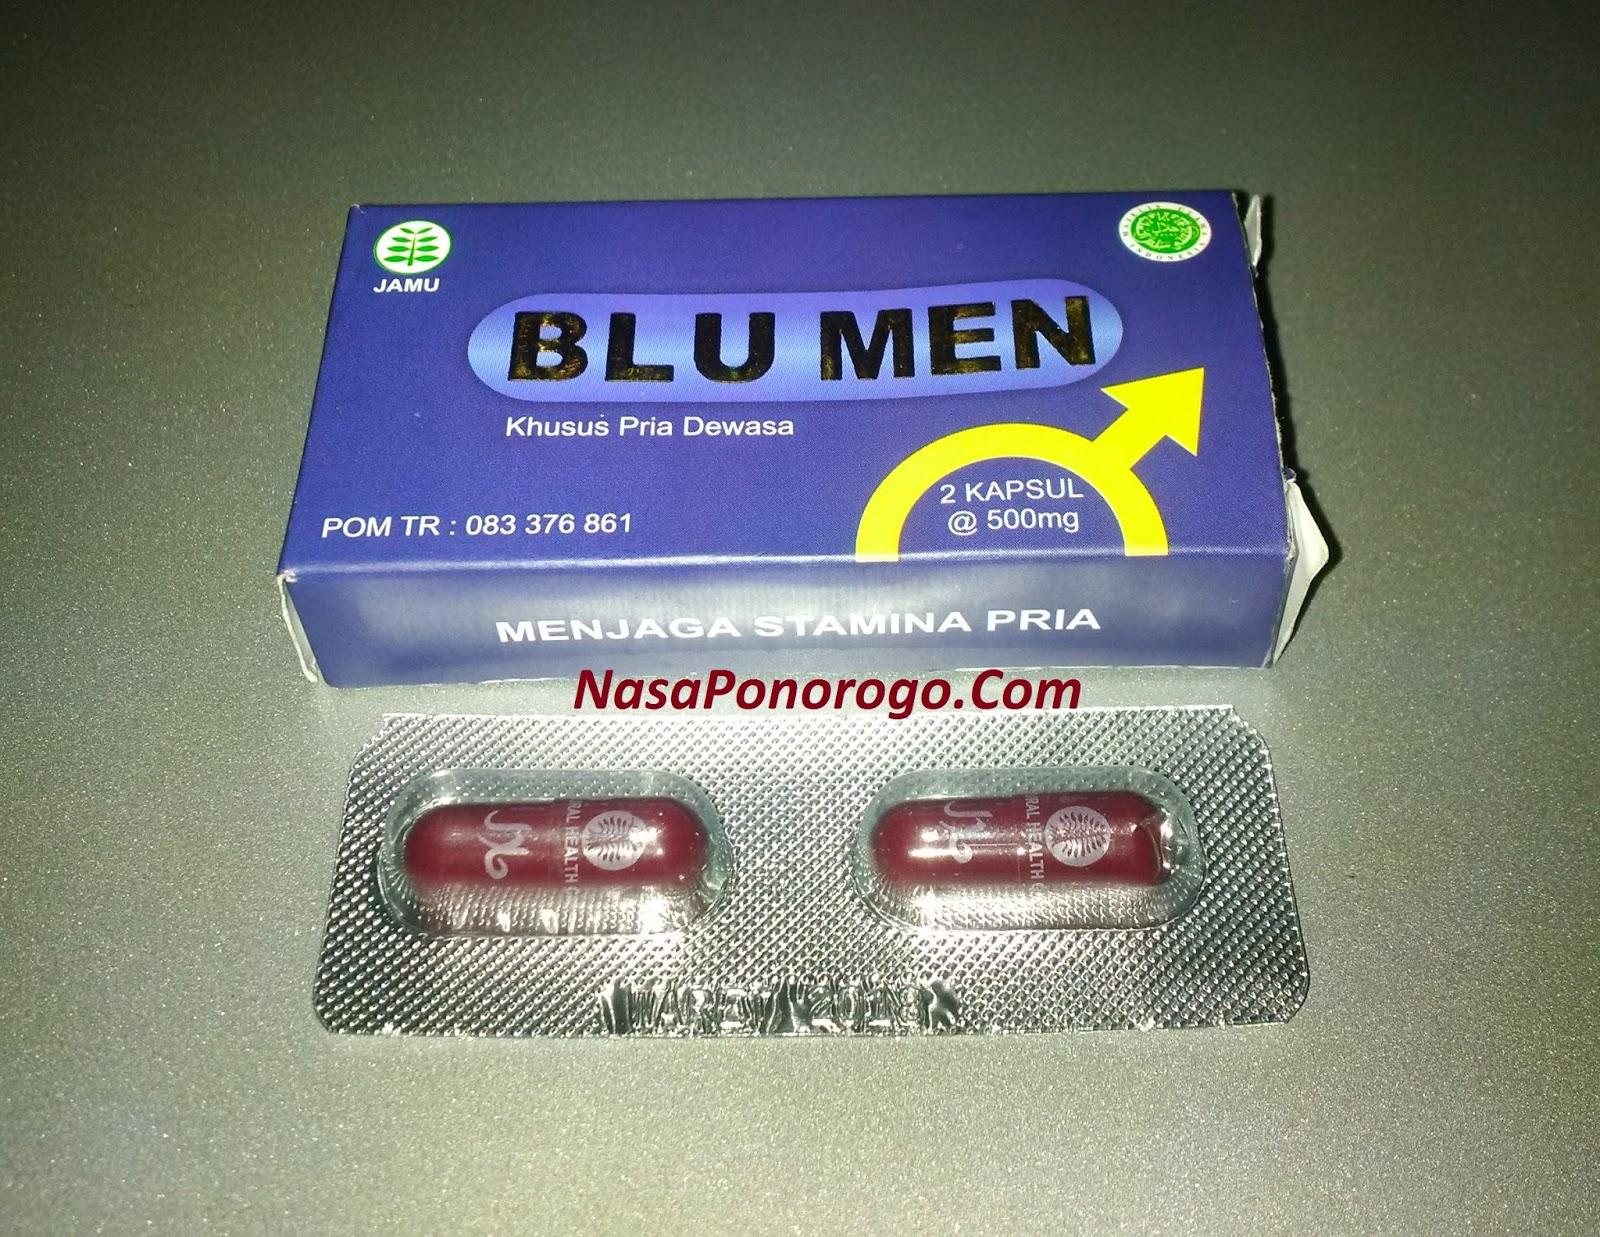 obat kuat khasiat obat kuat blumen nasa pembesarpenissexsolo